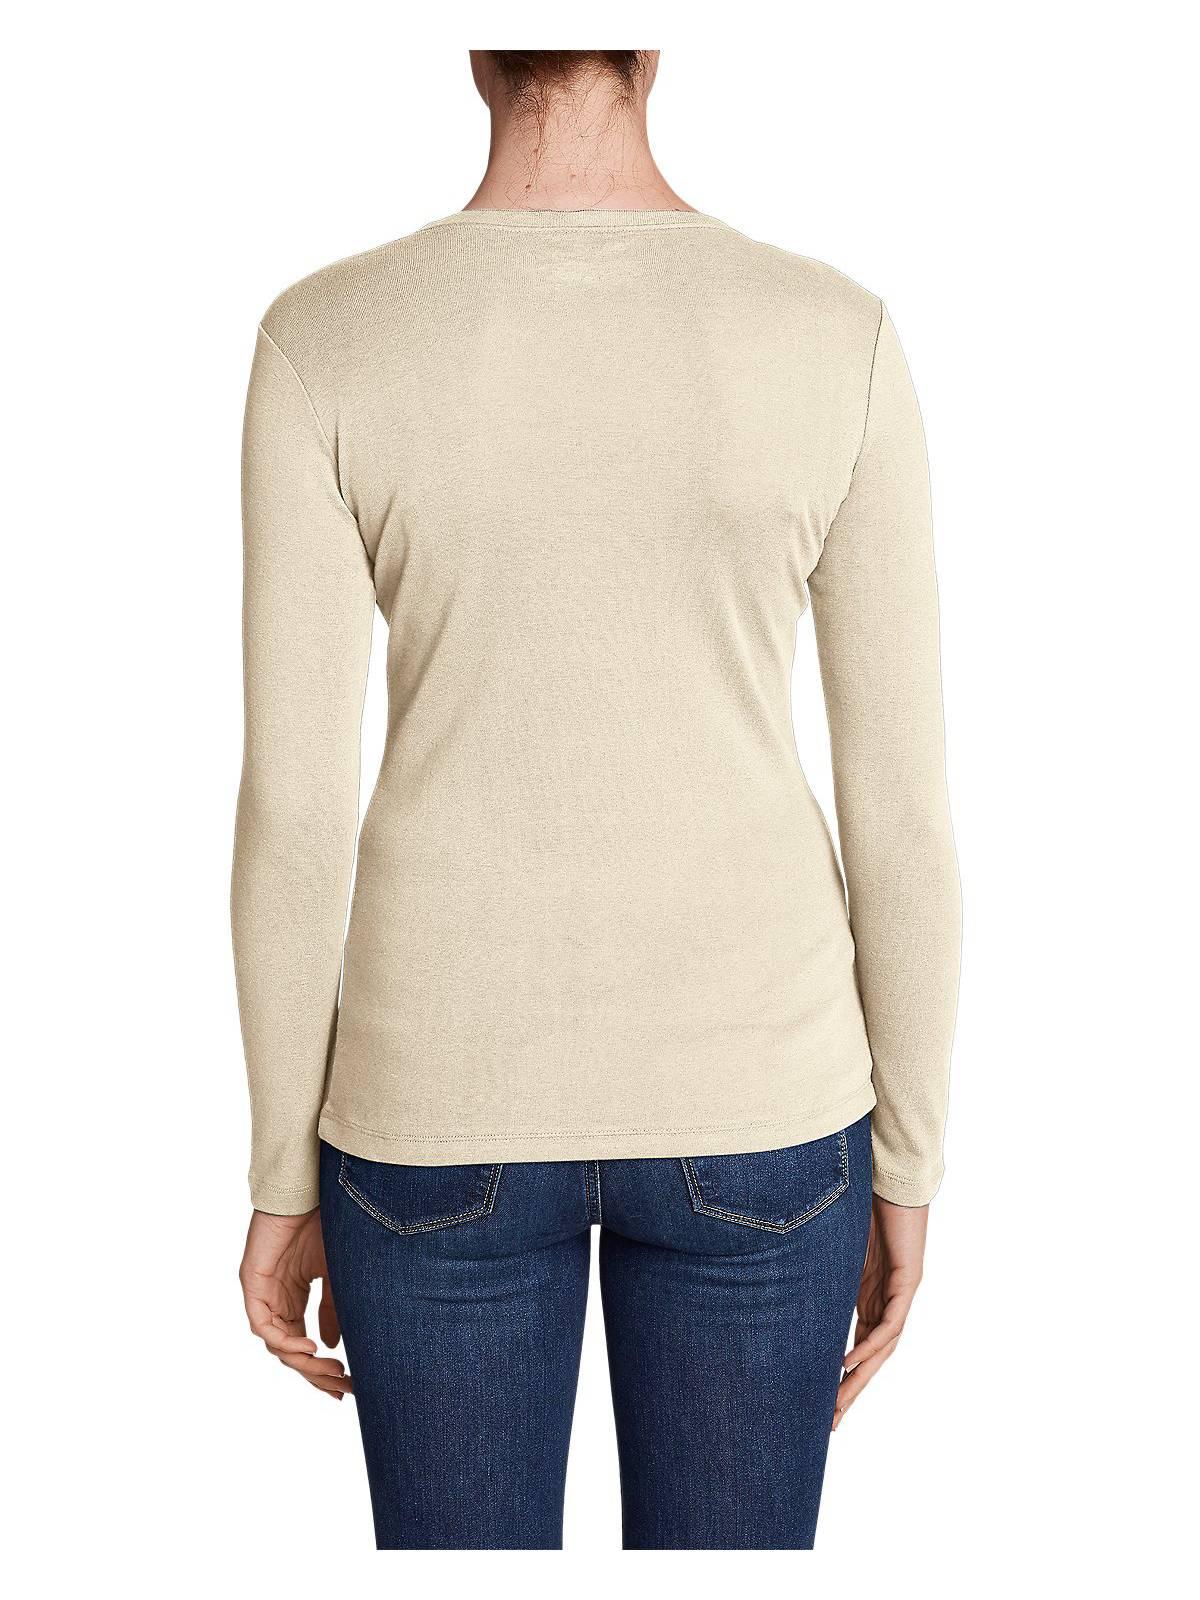 Eddie-Bauer-Women-039-s-Favorite-Long-Sleeve-V-Neck-T-Shirt thumbnail 15